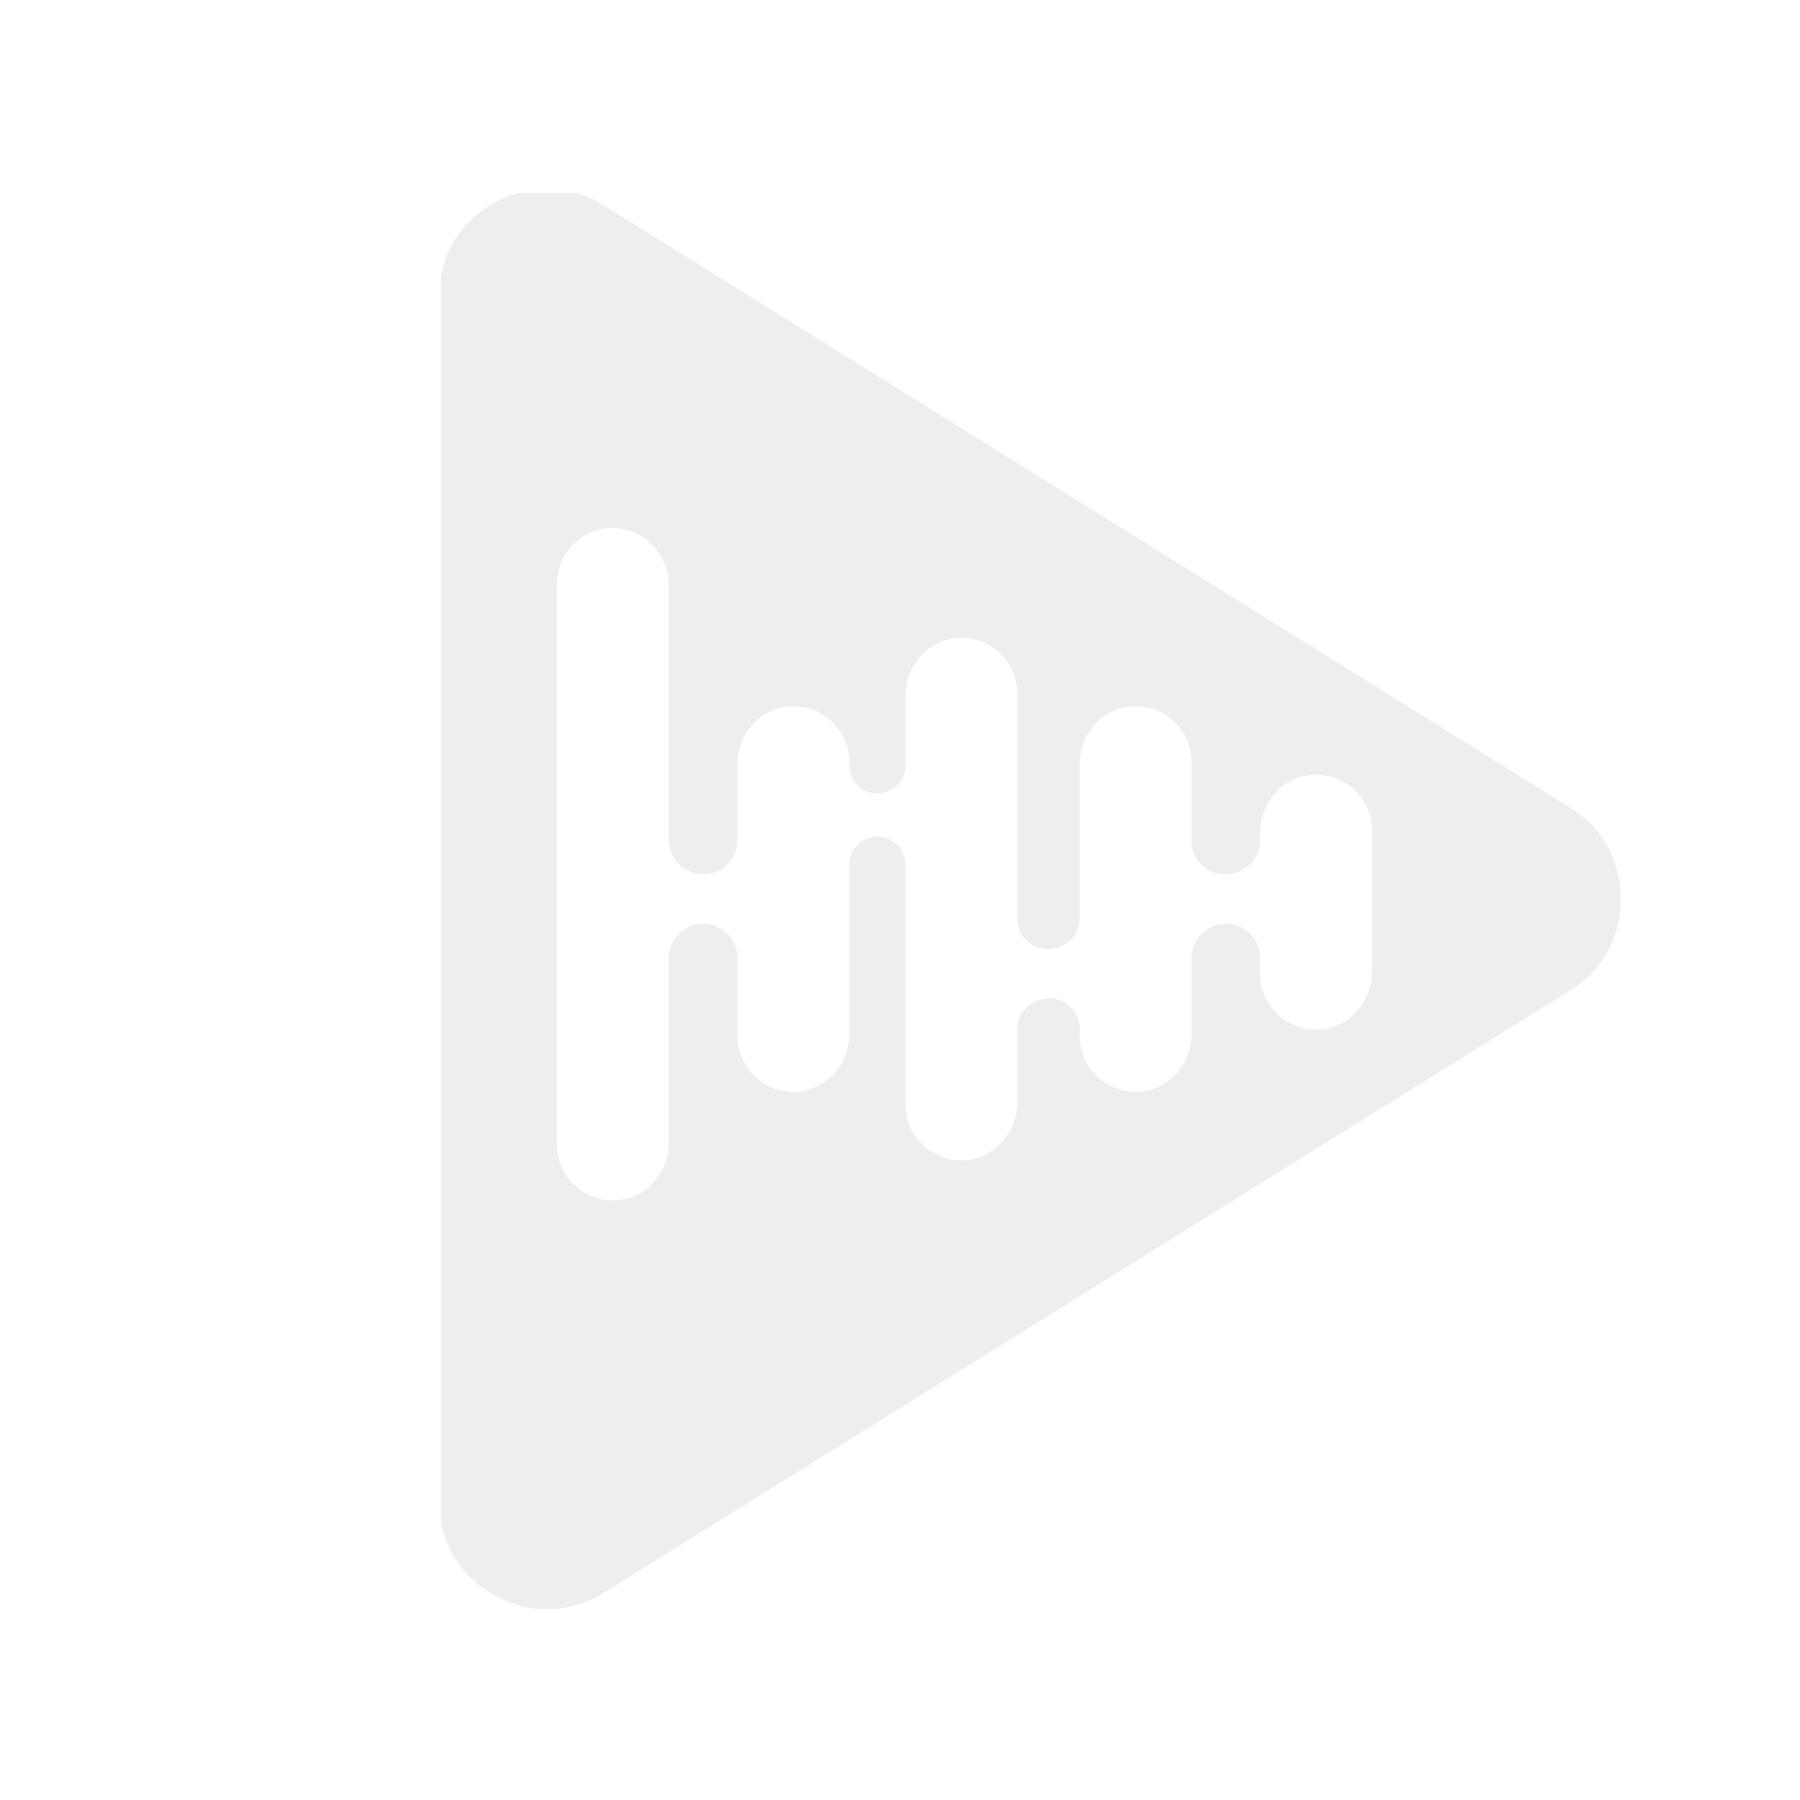 Speedsignal C-3414104